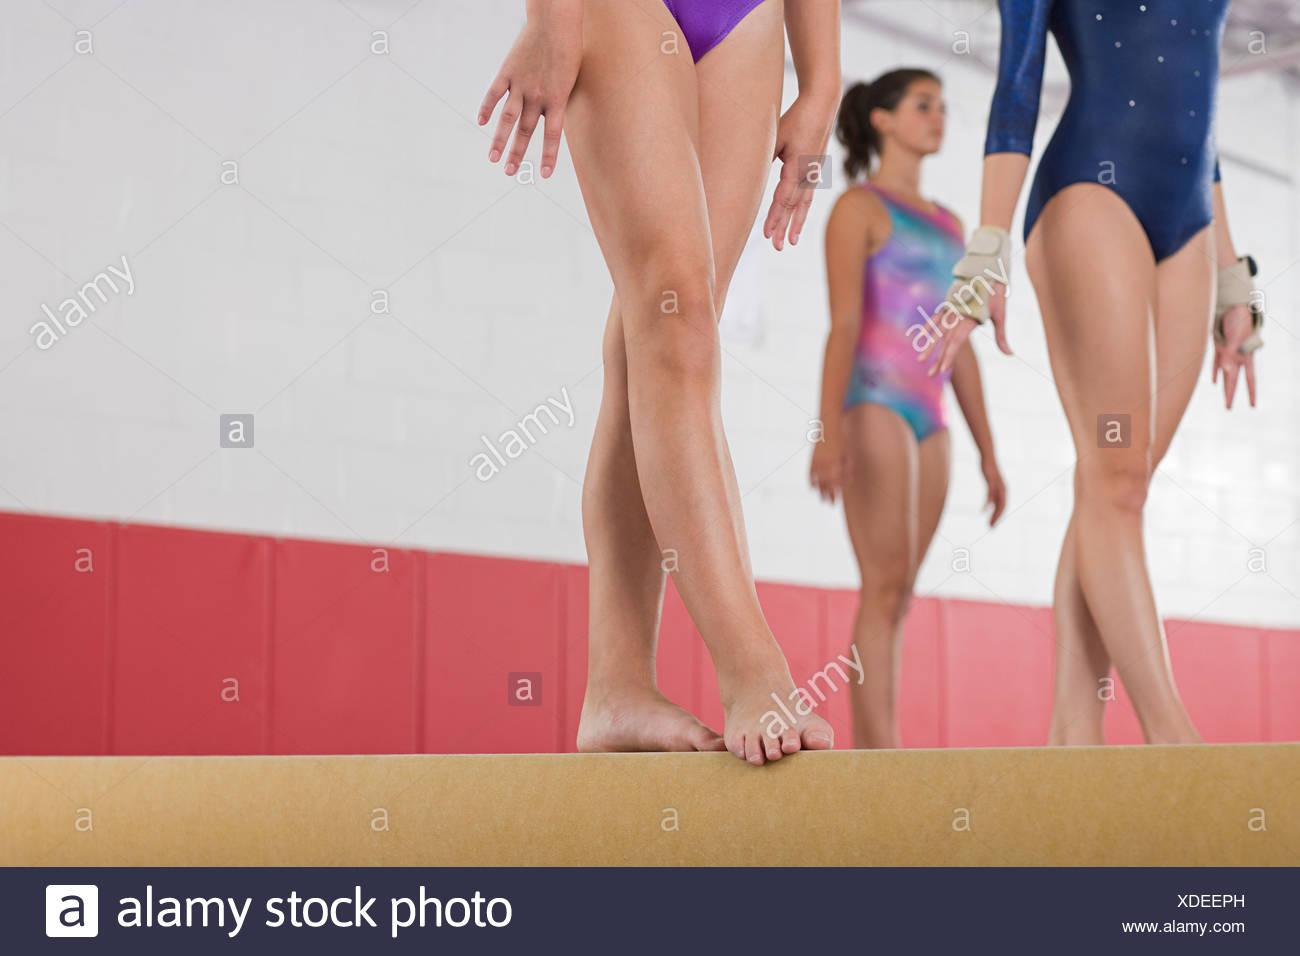 Gymnasts standing on a balance beam - Stock Image